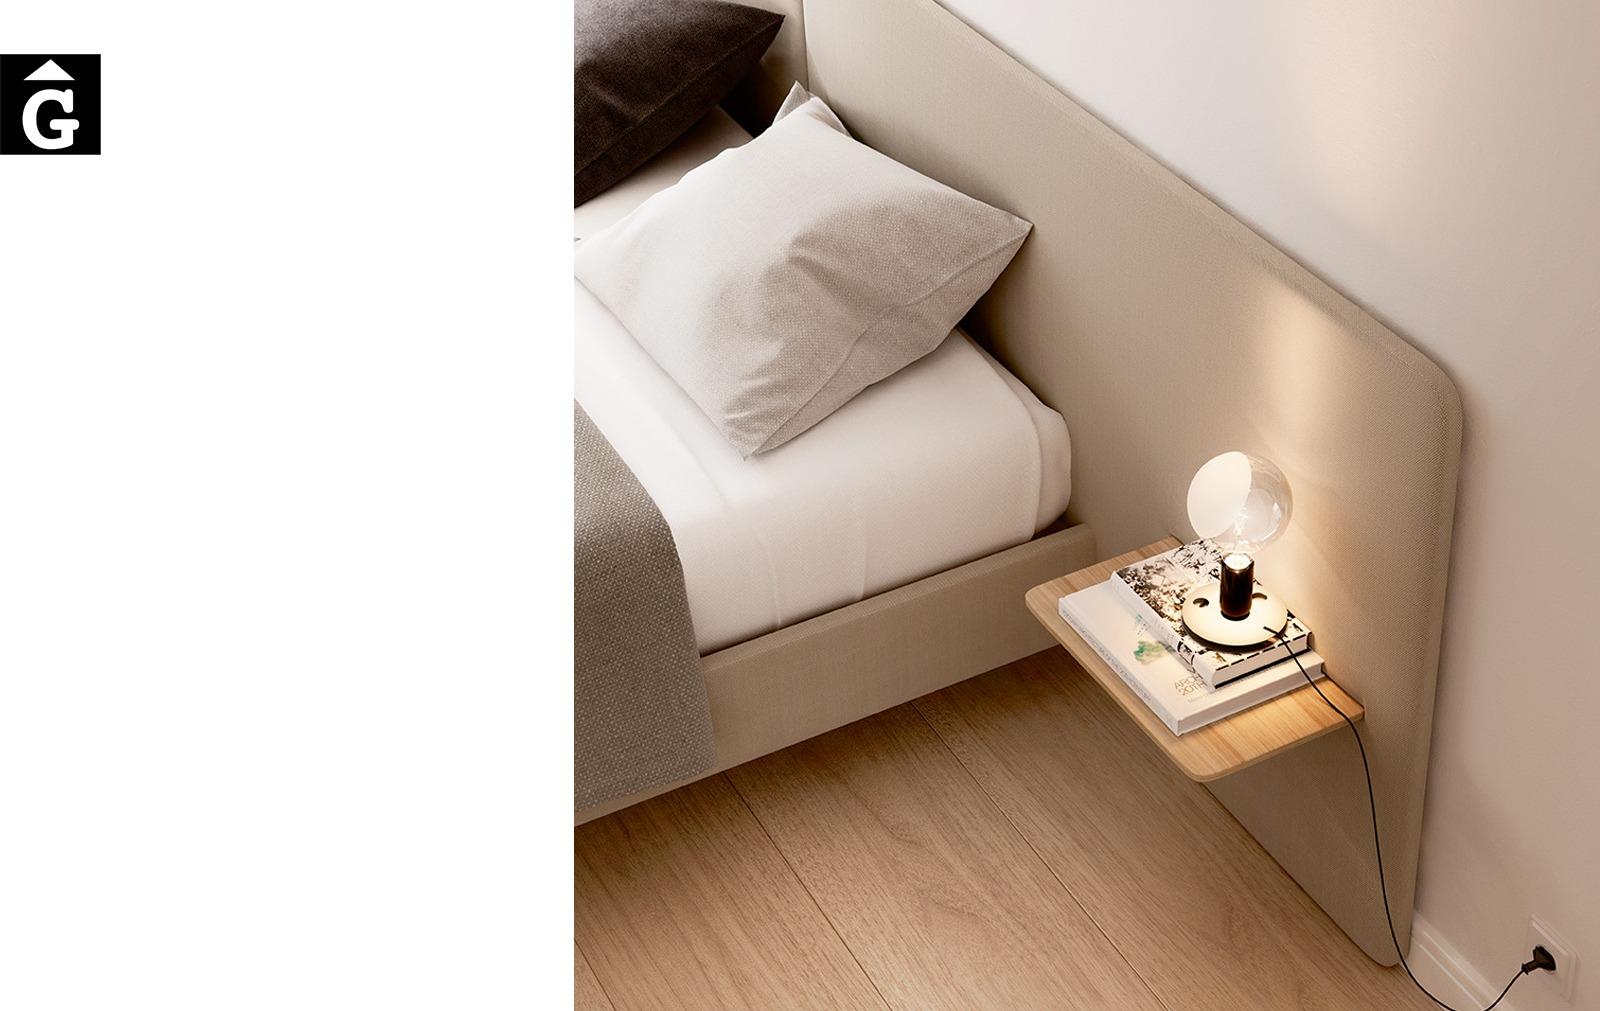 Llit Lota entapissat detall capçal Treku Home selecció Gifreu mobles Girona